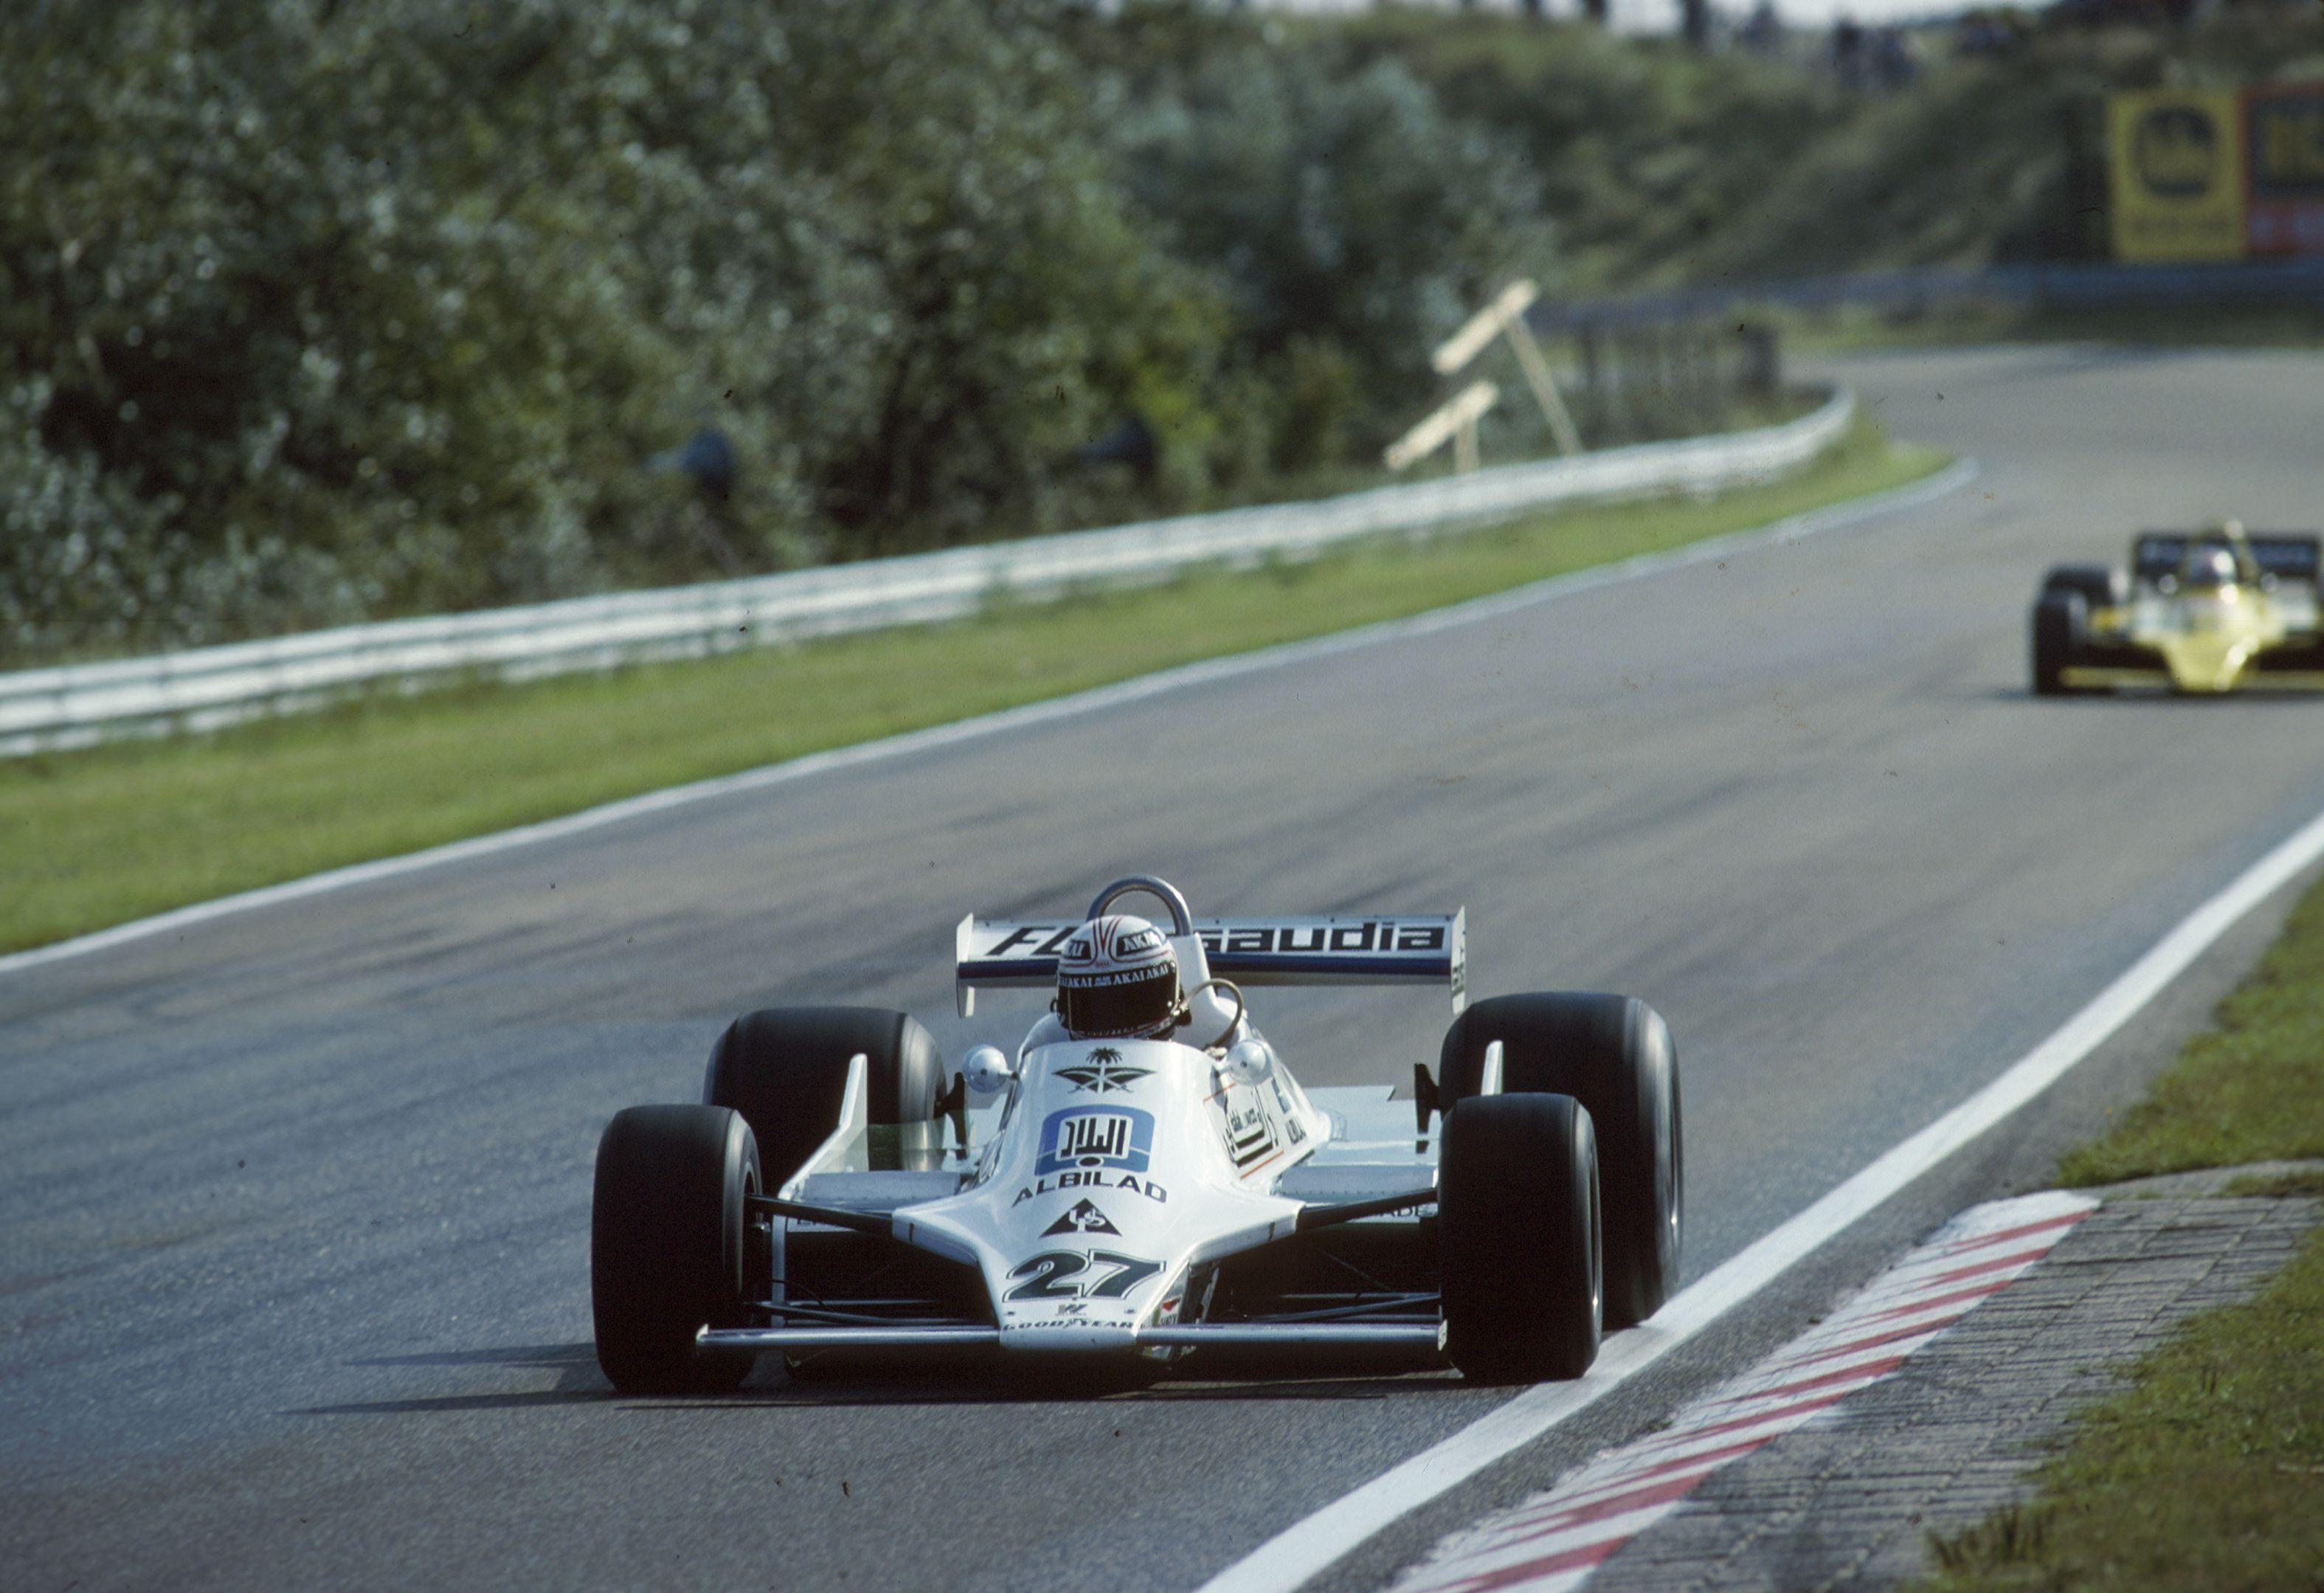 1979 Zandvoort (Alan Jones Williams FW07, Hans Joachim Stuck